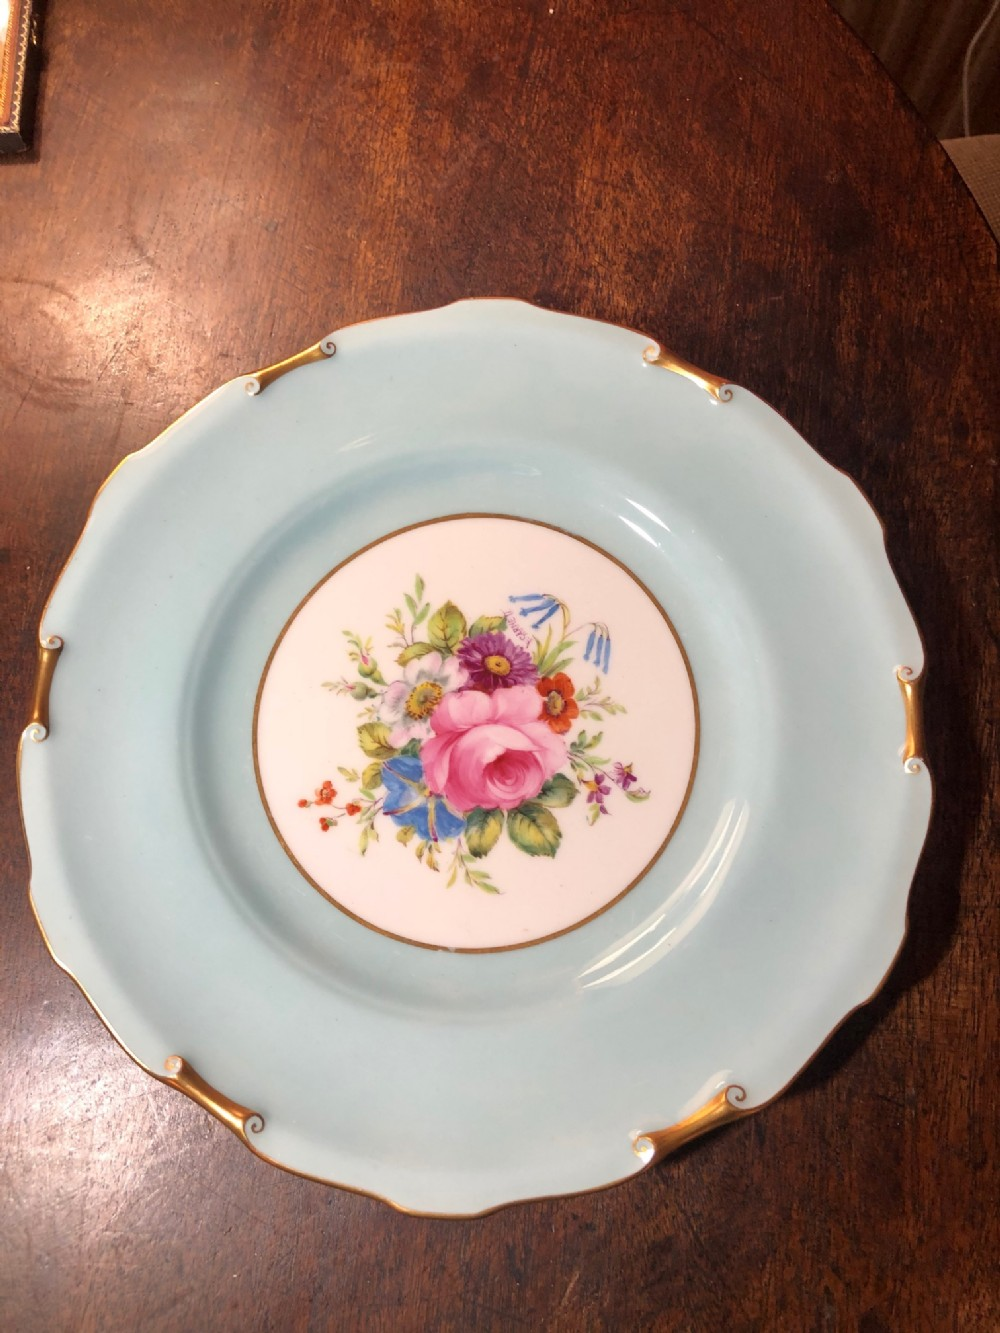 royal crown derby plate painted by f garnett